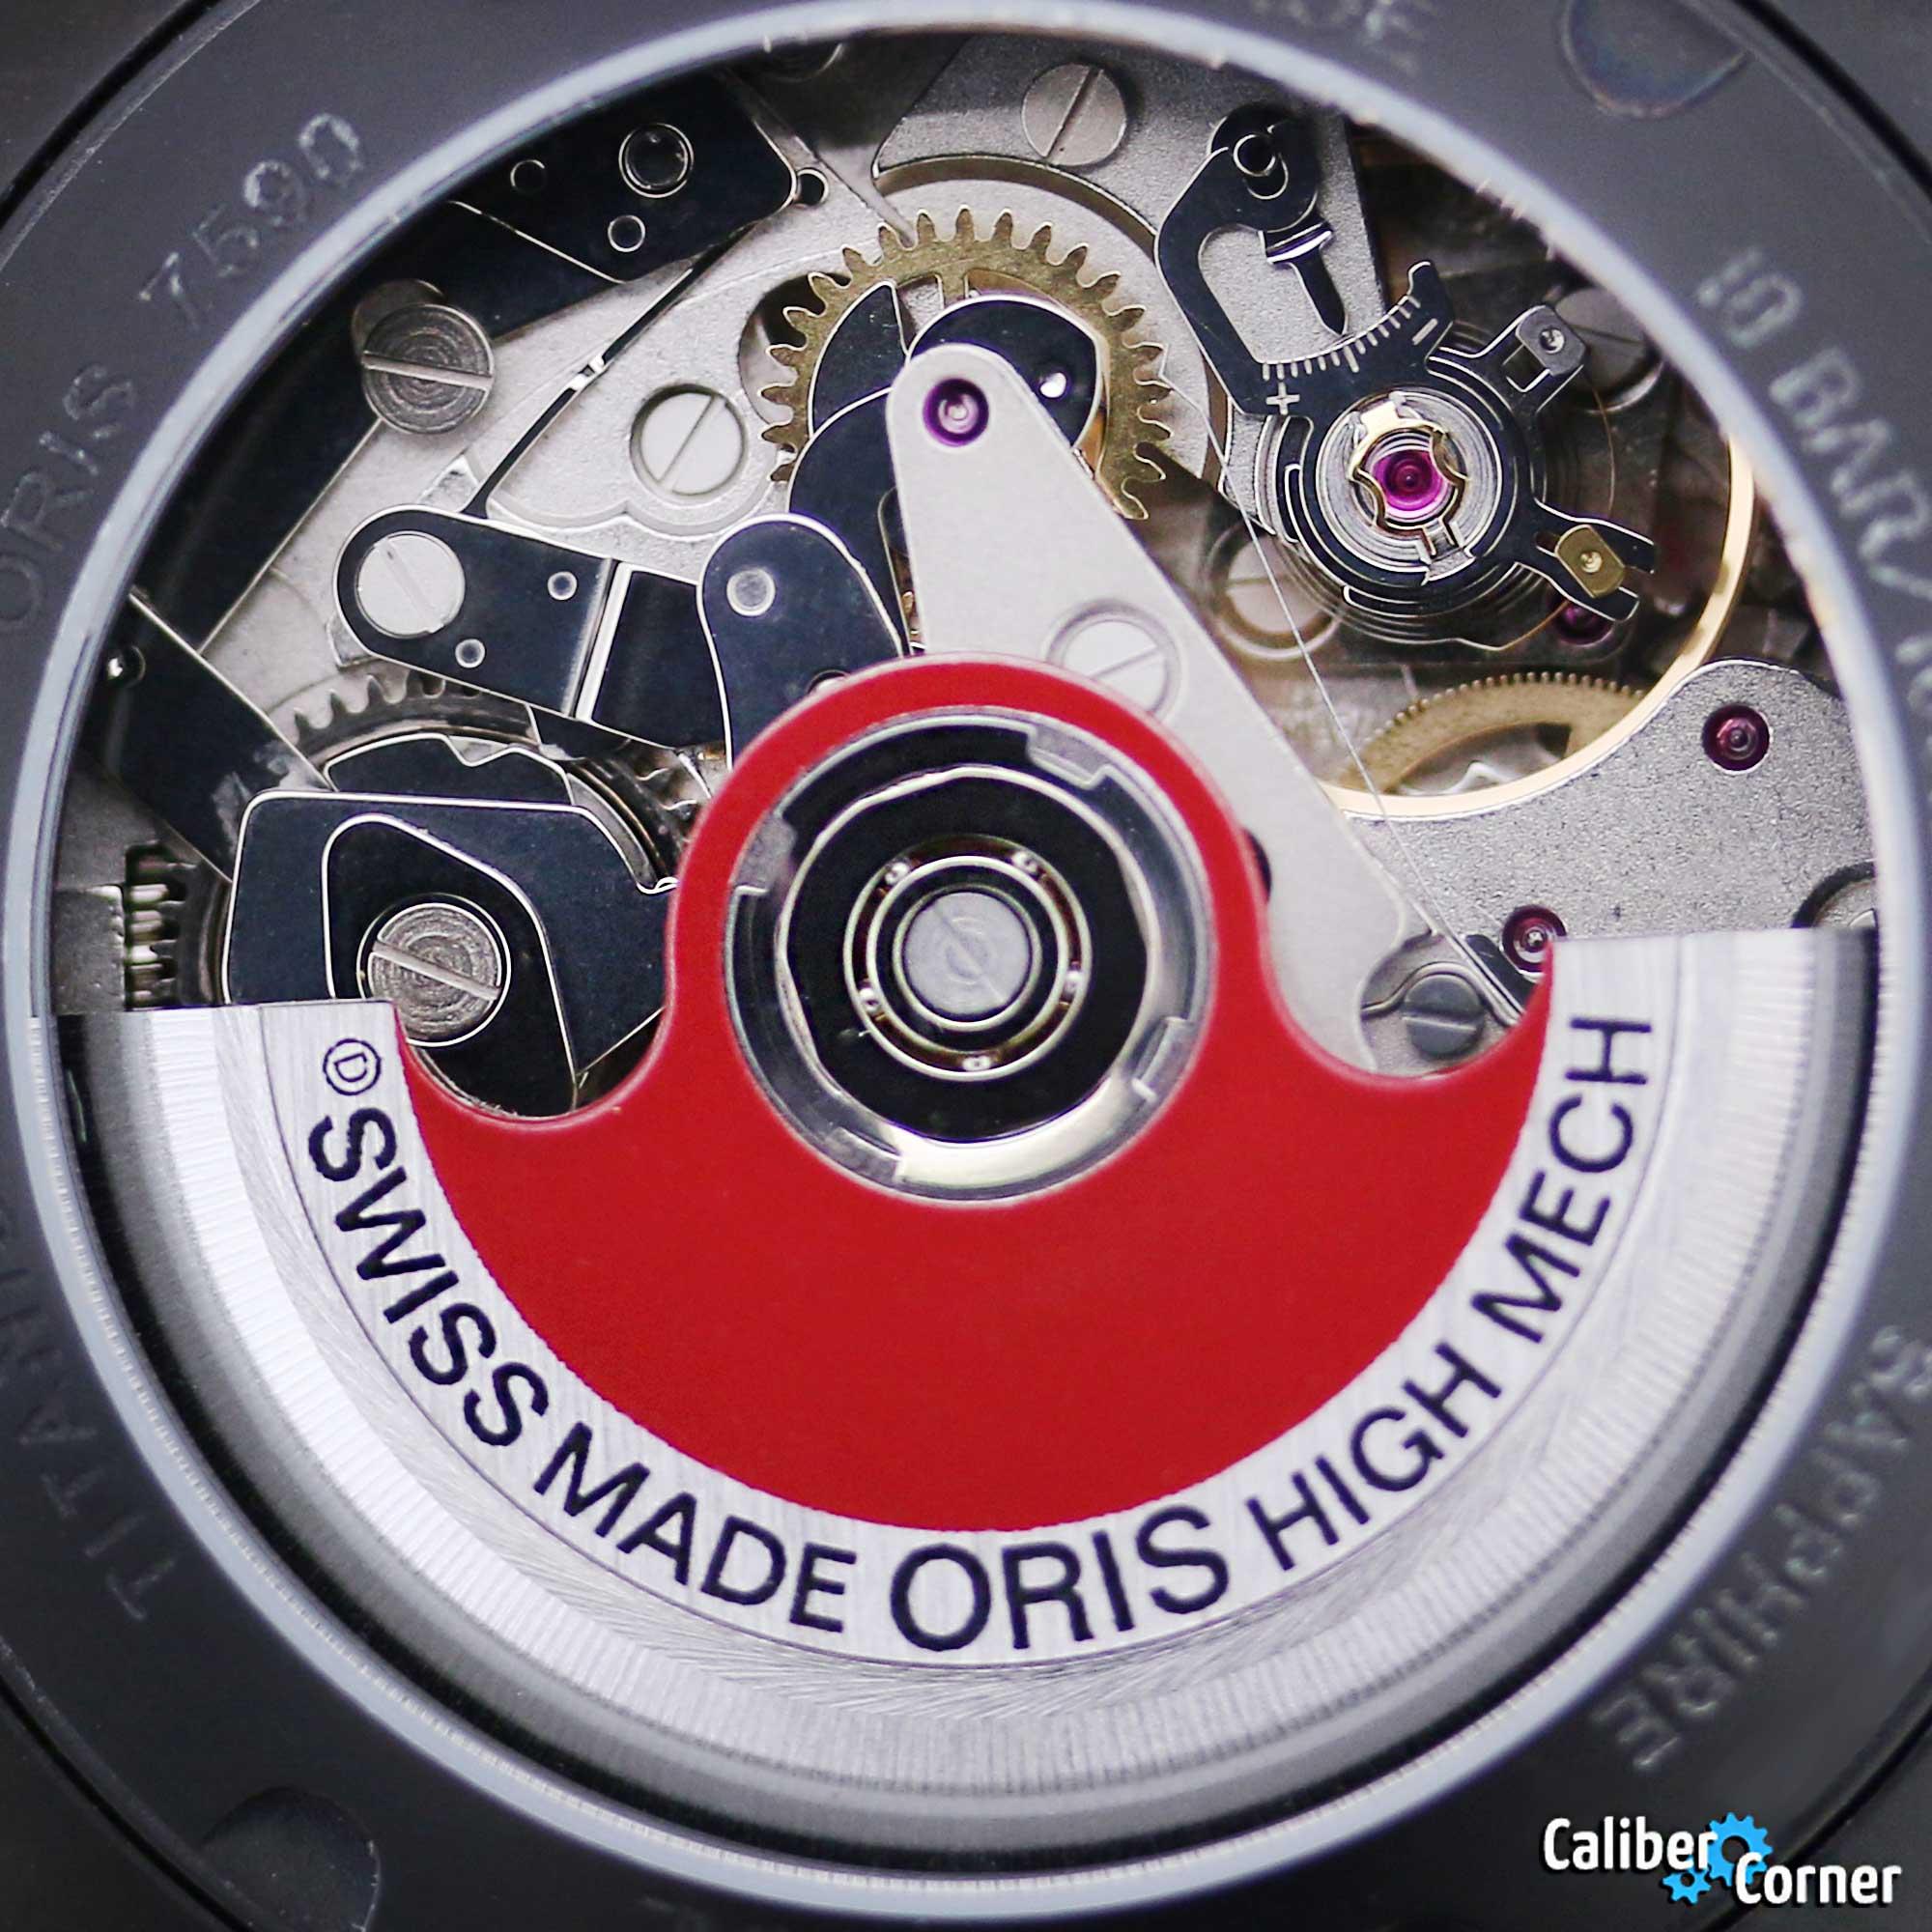 Oris caliber 677 aka ETA 7754